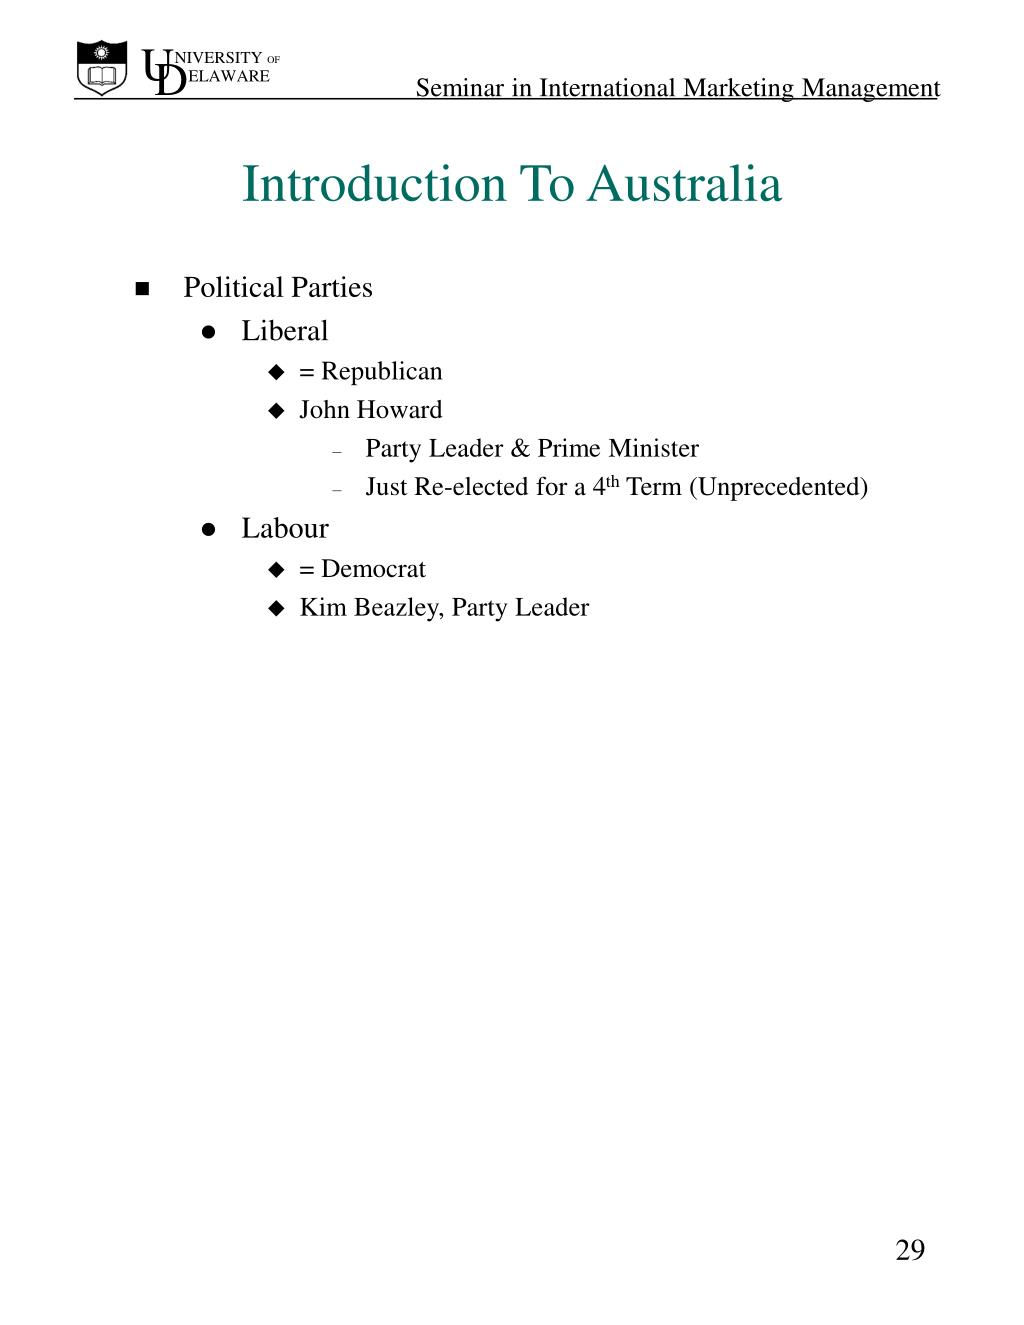 Introduction To Australia